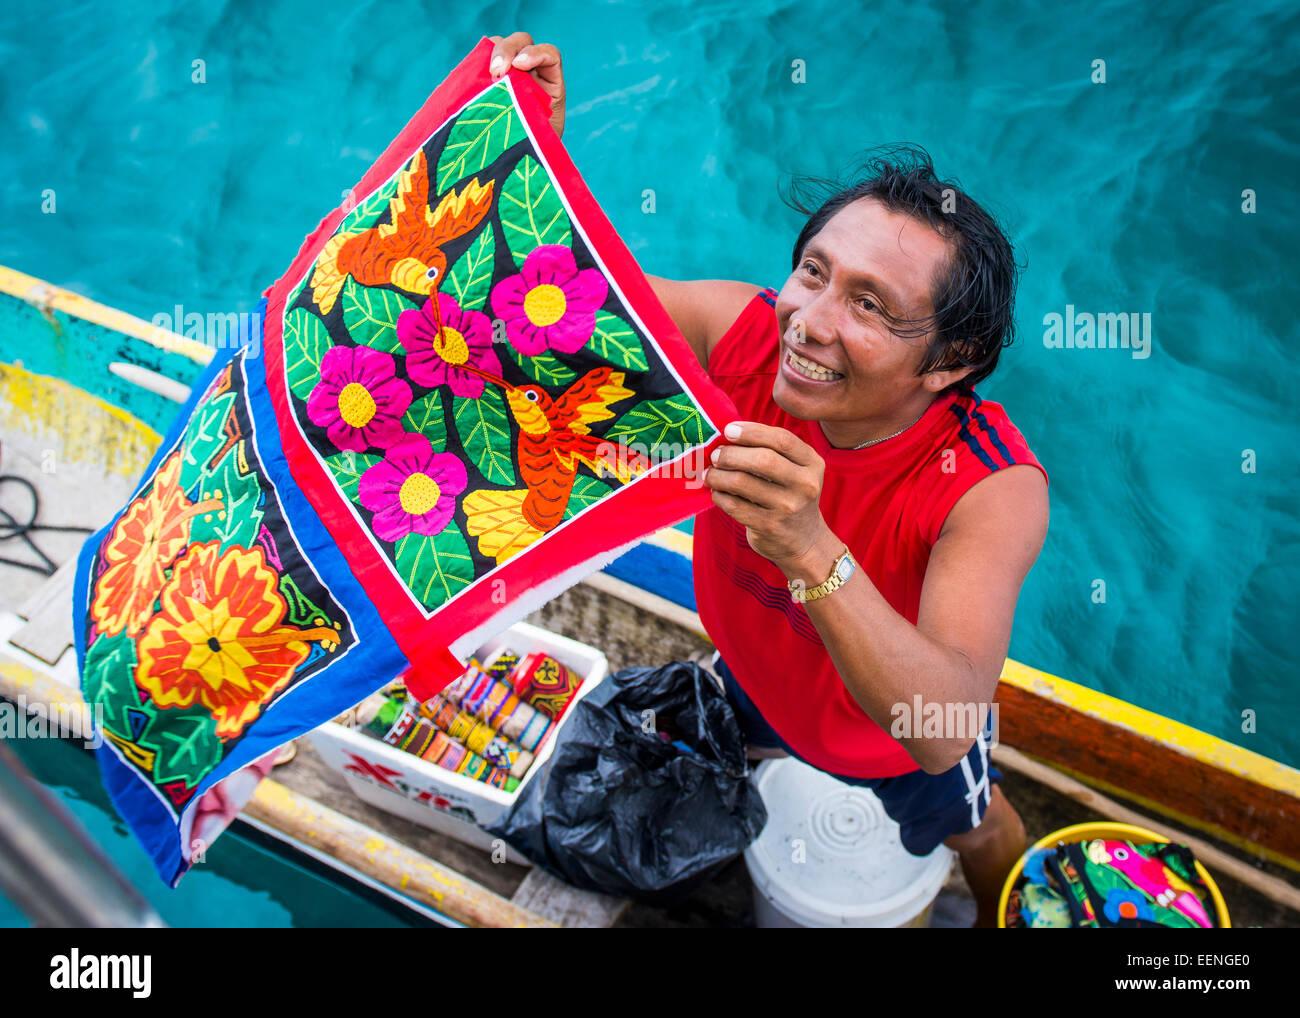 Kuna salesman selling colourful cloth, San Blas Islands, Panama - Stock Image